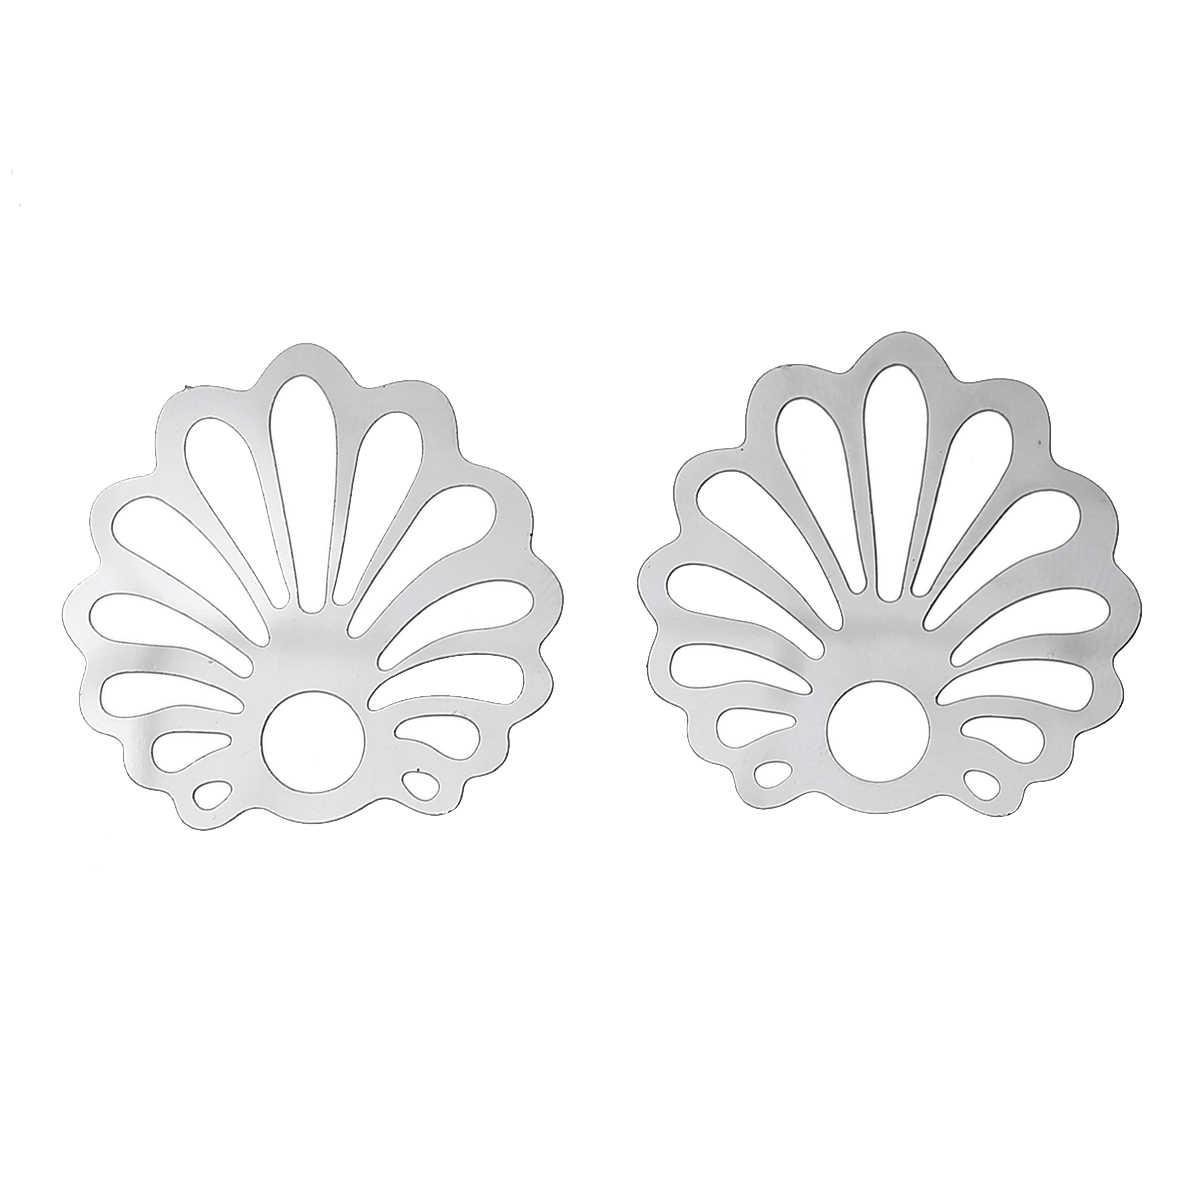 "DoreenBeads Filigree สแตนเลส Embellishments ผลการค้นหา SHELL Silver TONE Hollow Stripe 30 มม.(1 1/8 "") X 29 มม.(1 1/8 ""),1 ชิ้น"